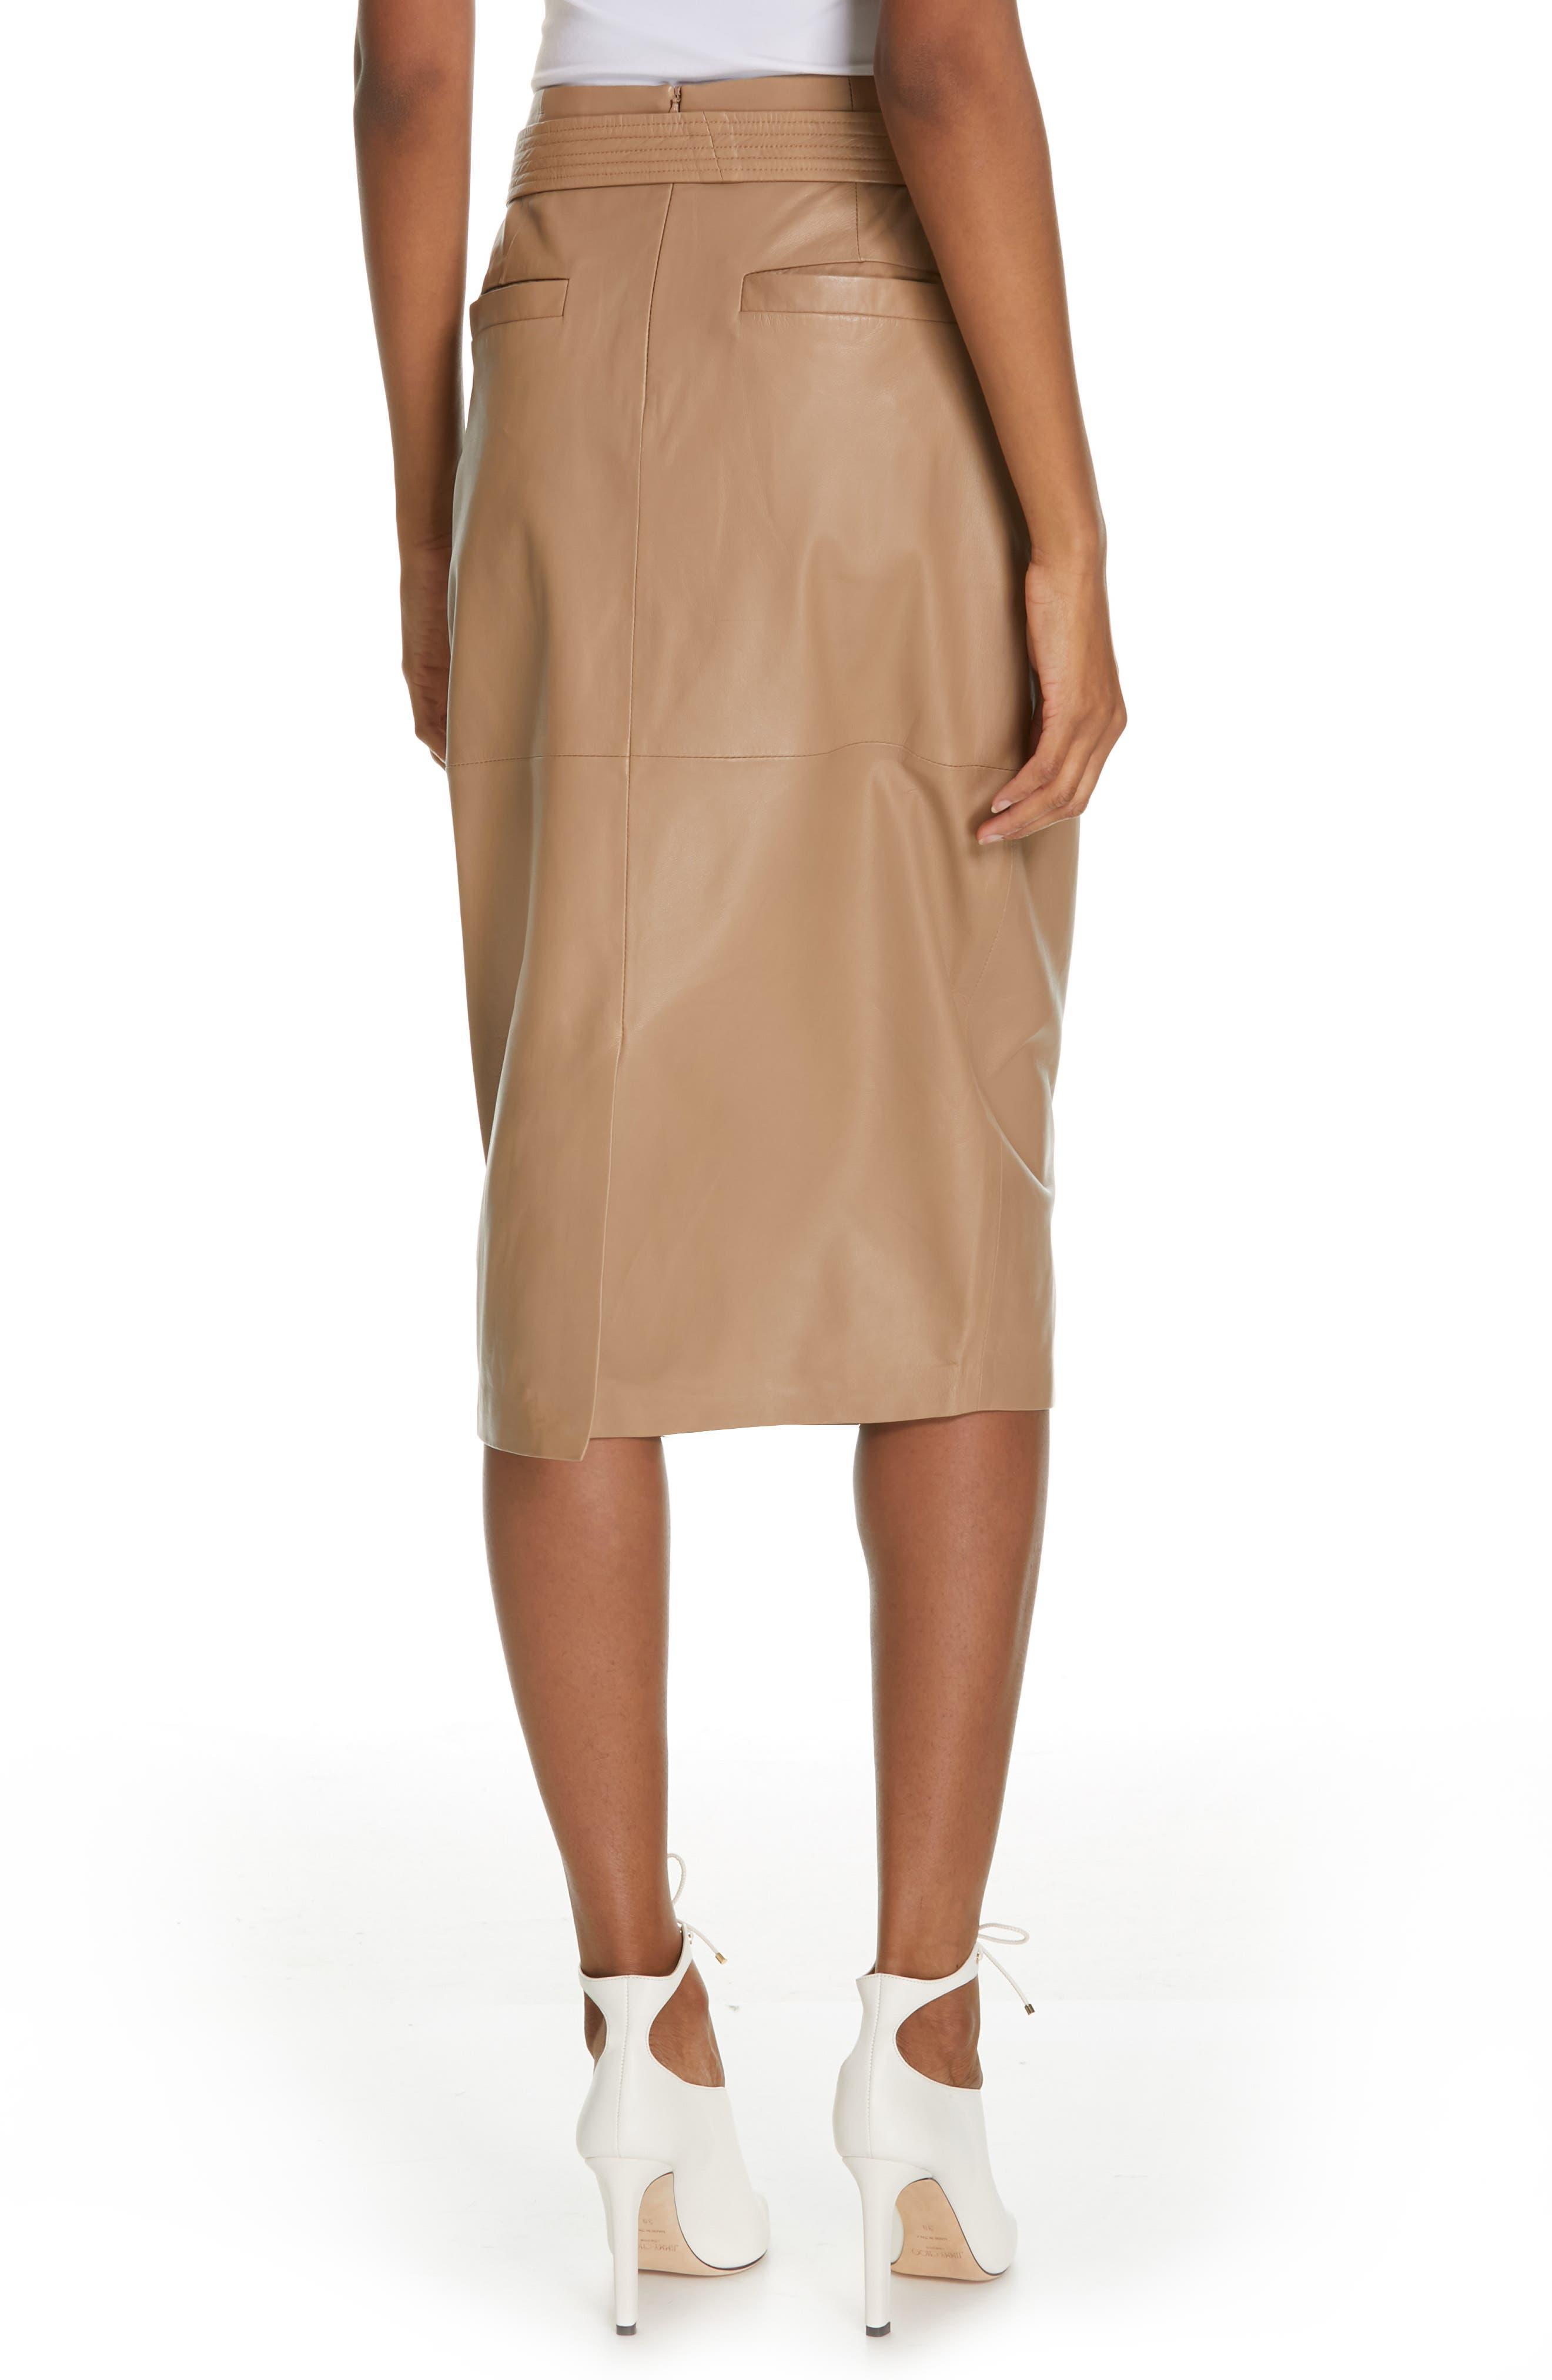 Alouetta Leather Skirt,                             Alternate thumbnail 2, color,                             BOIS